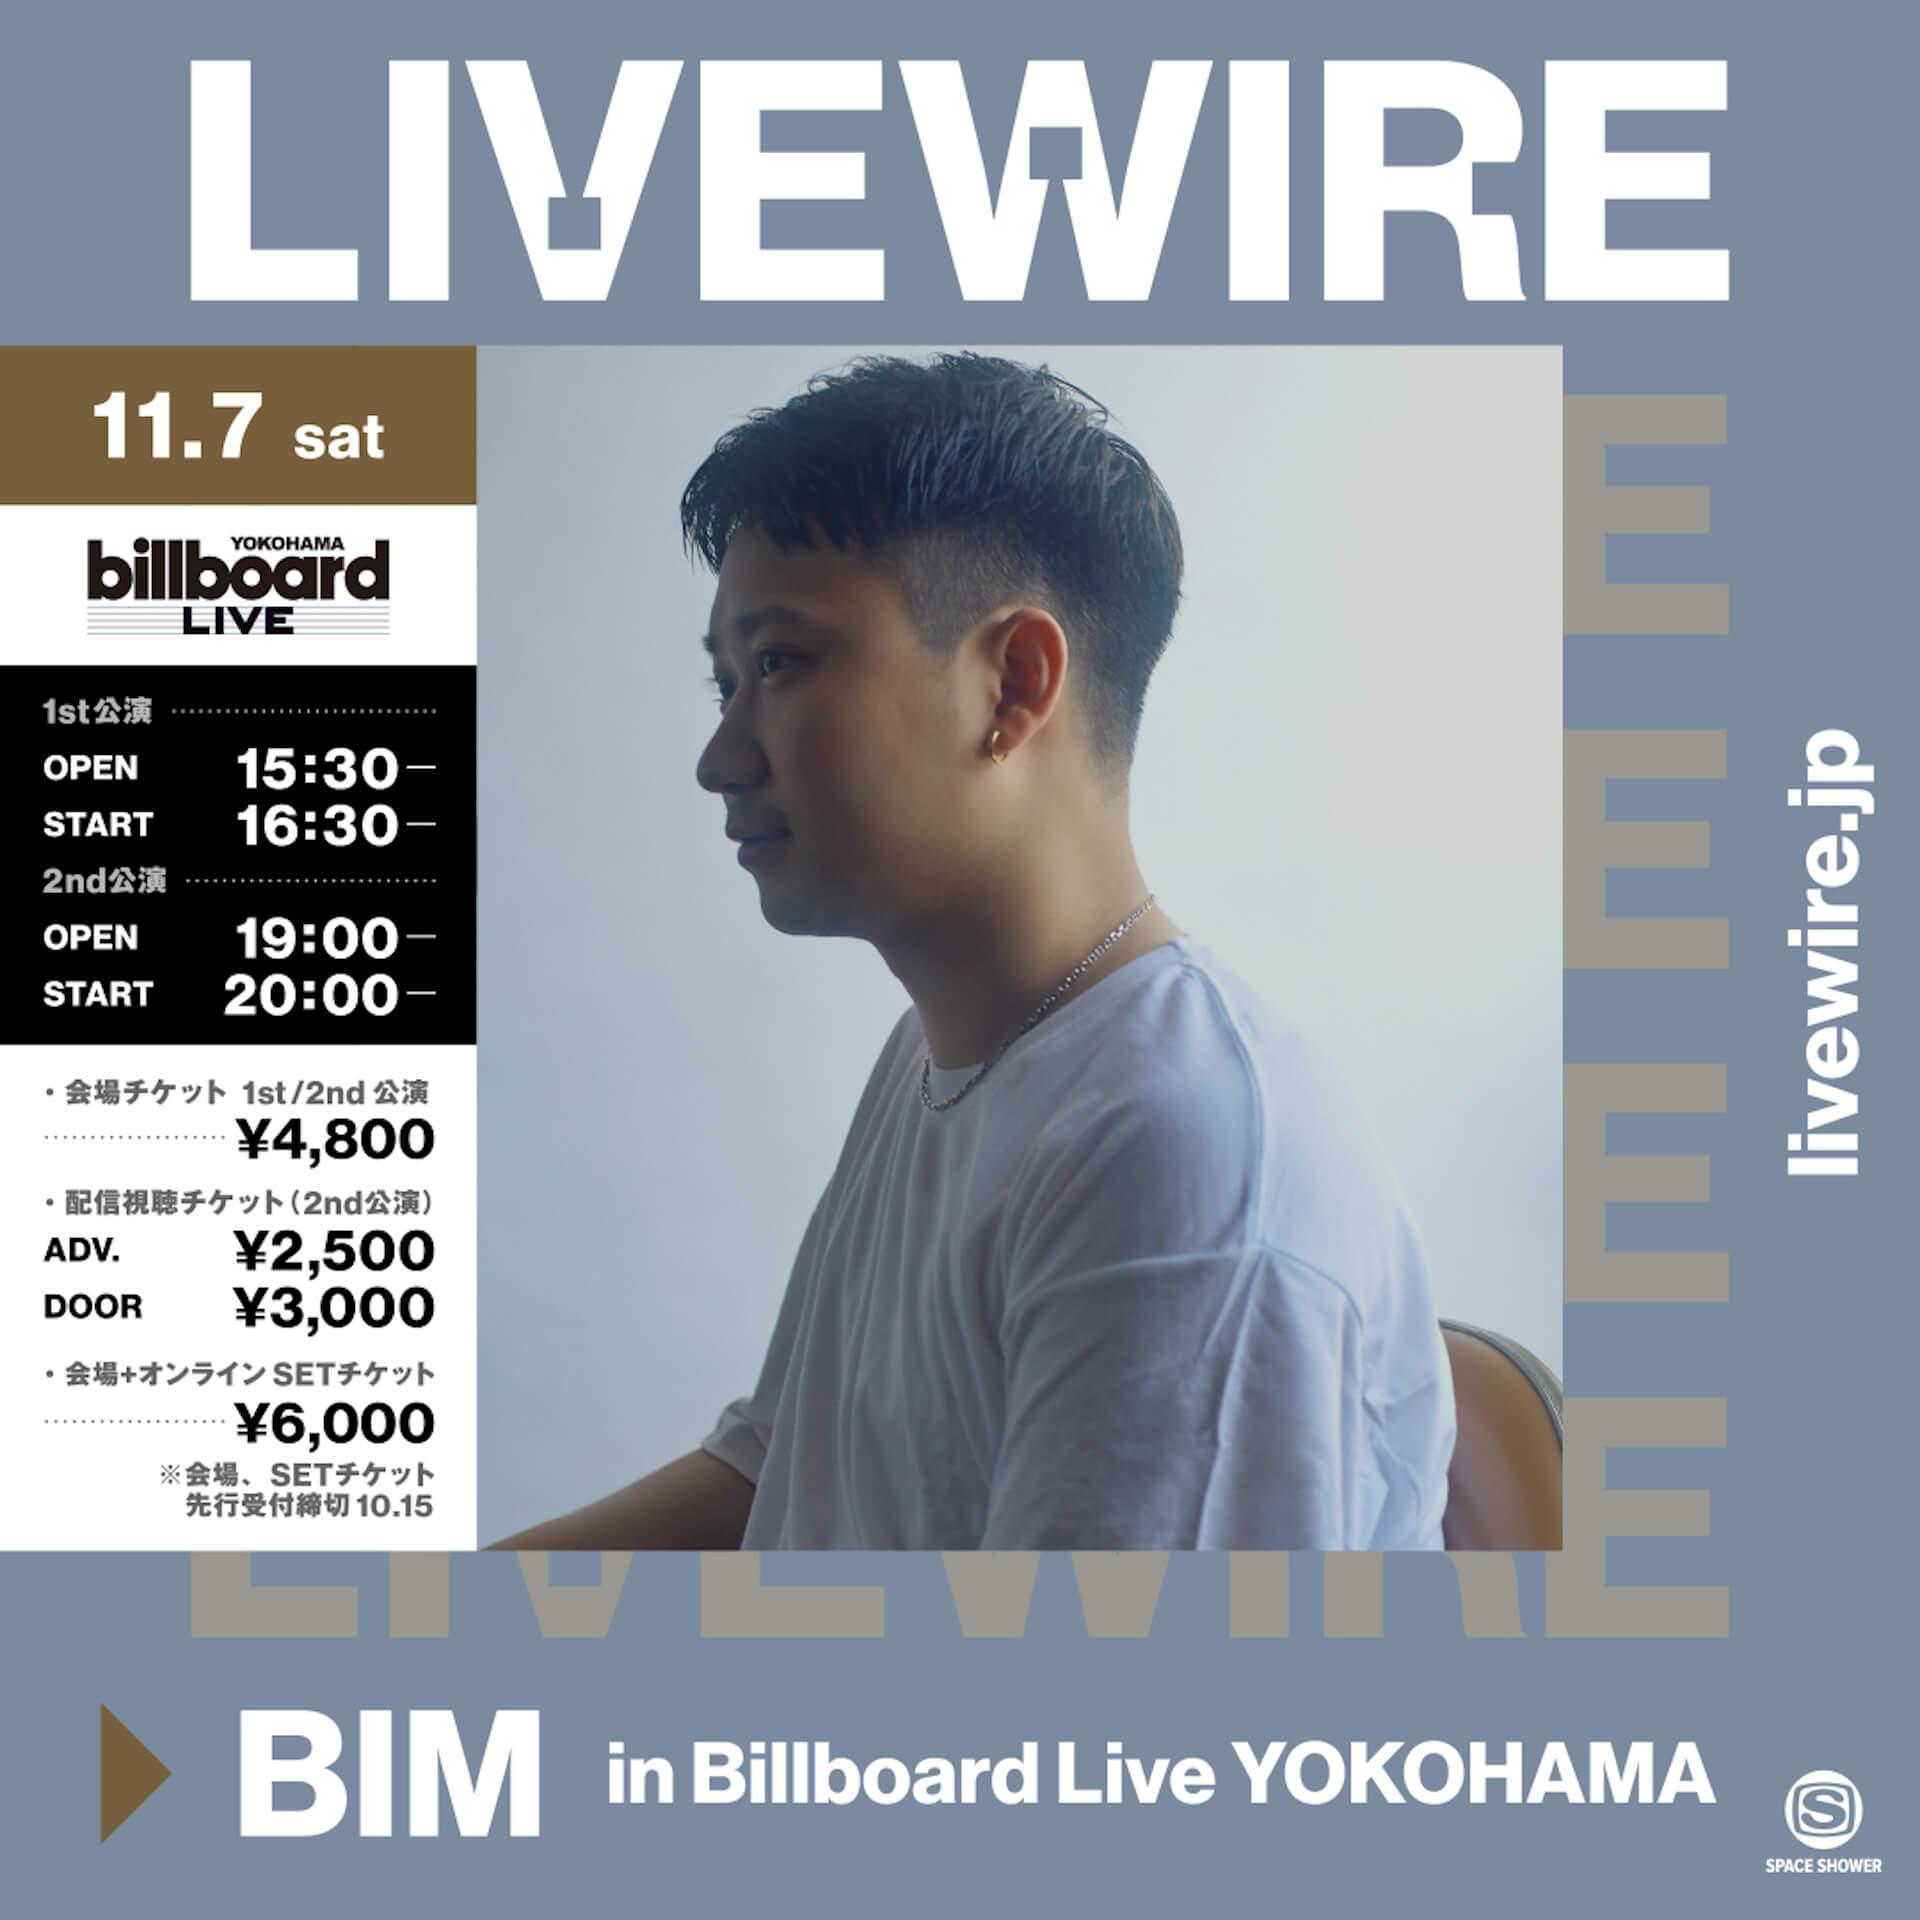 BIM初のBillboard Live YOKOHAMAバンドセットライブが<LIVE WIRE>にて生配信決定!本人の音楽ルーツに迫るインタビューも公開 music2020109_livewire_bim_1